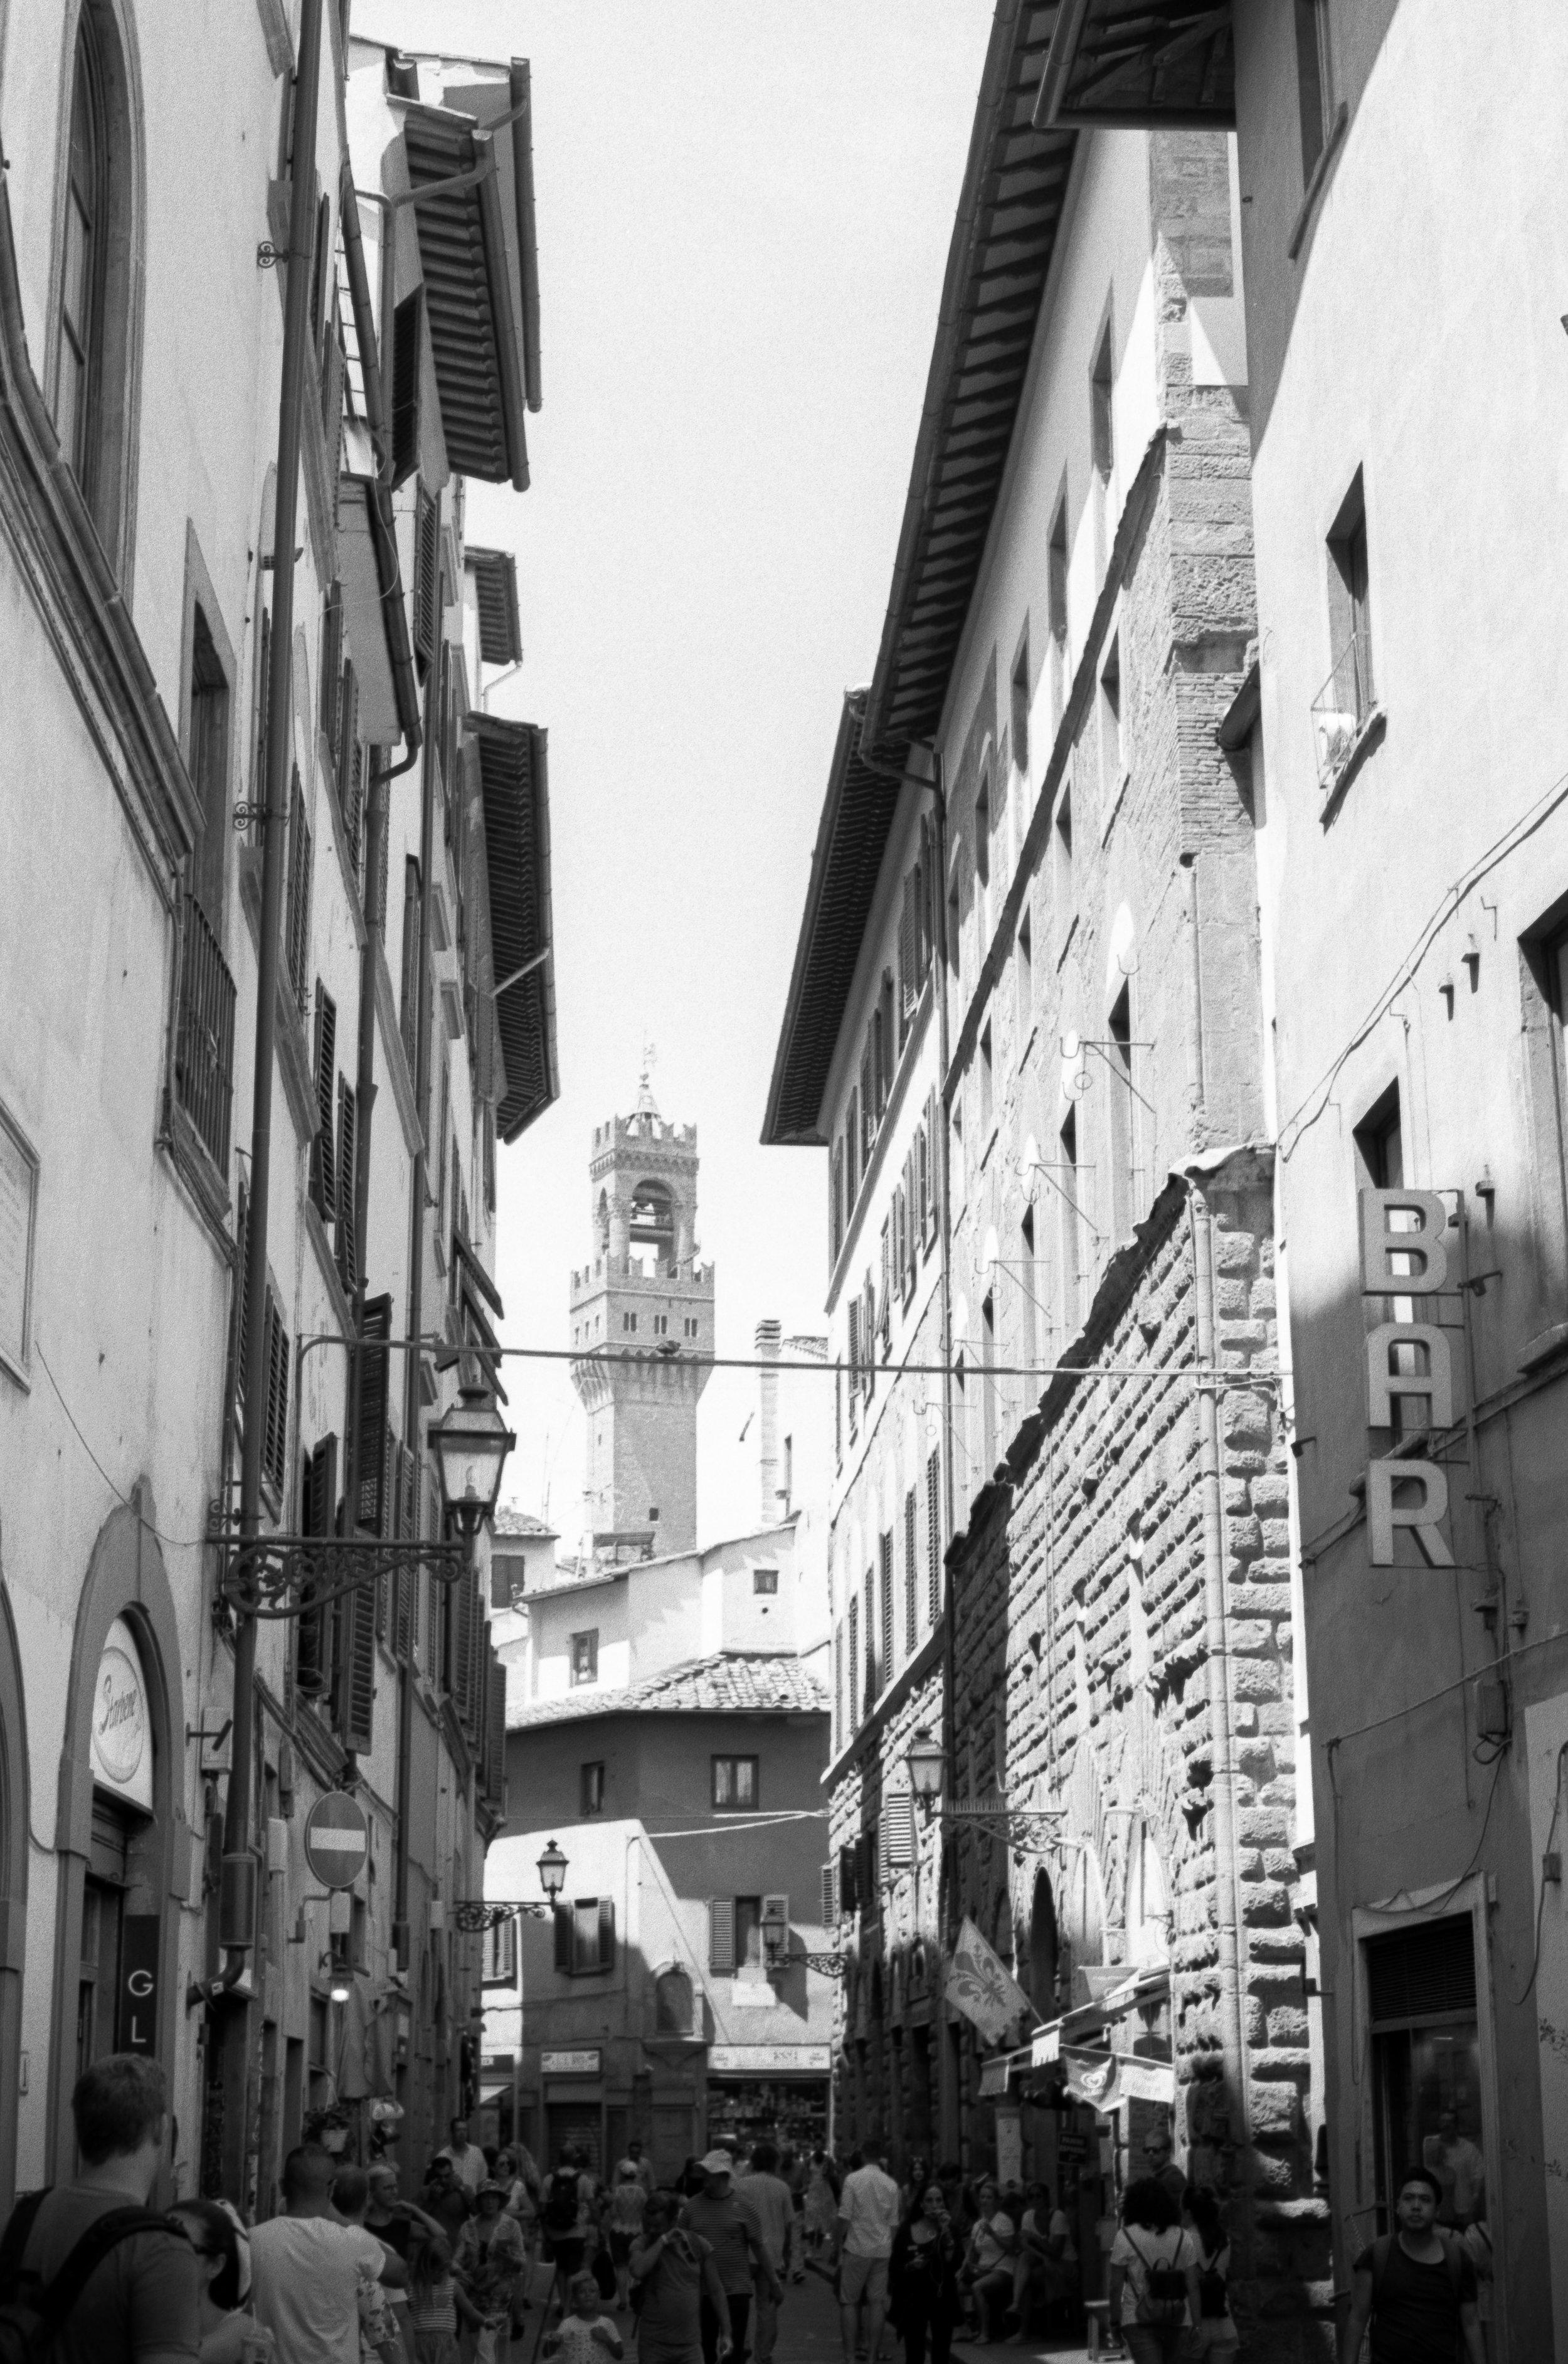 Palazzo Vecchio, Florence. Italy. 2019.